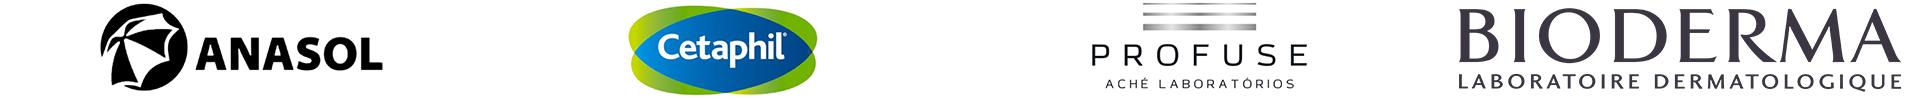 Tarja marcas 02